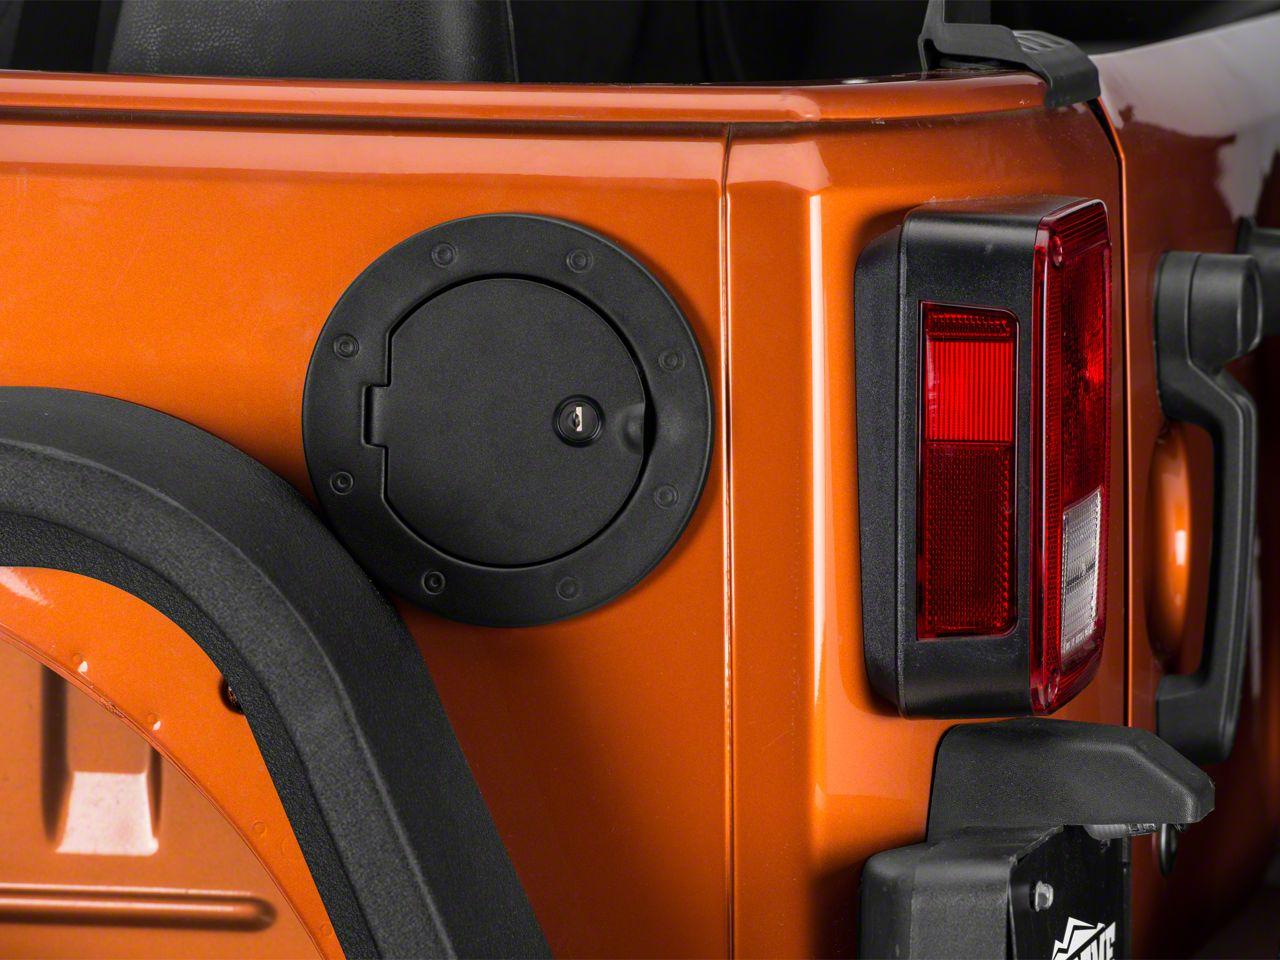 Hooke Road Locking Fuel Gas Tank Cap Cover for 2007-2018 Jeep Wrangler JK /& Unlimited